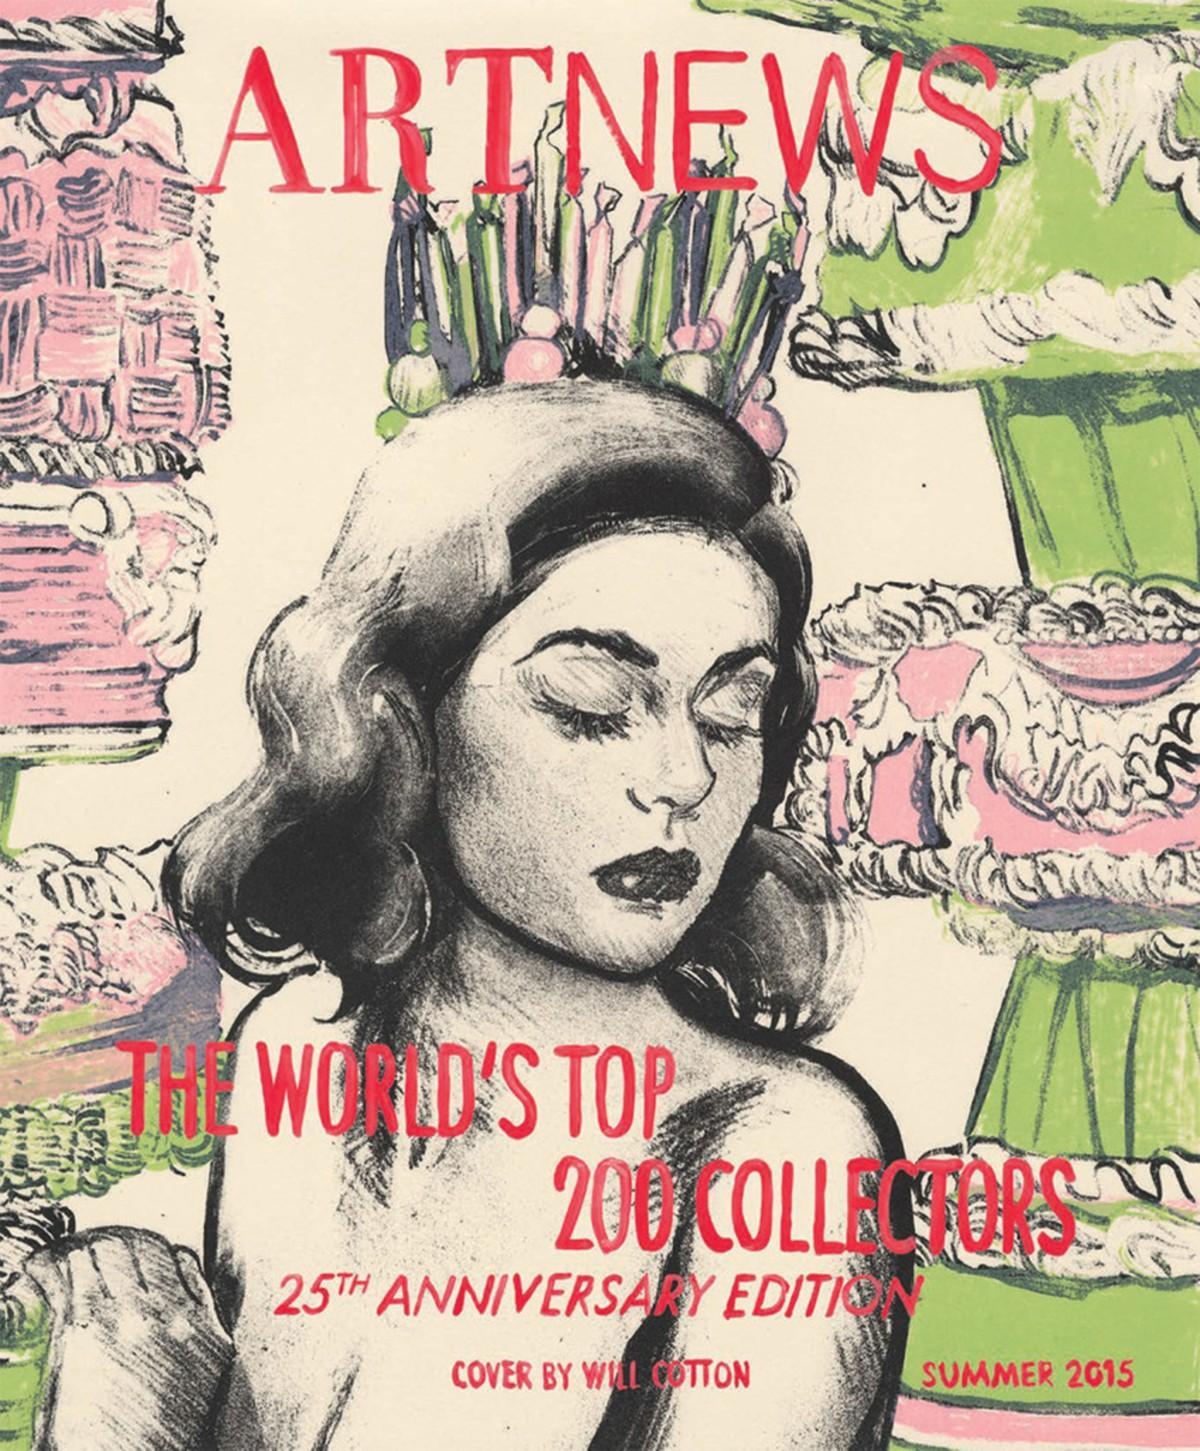 1000w_artnews_cover_credit_willcotton.jpg